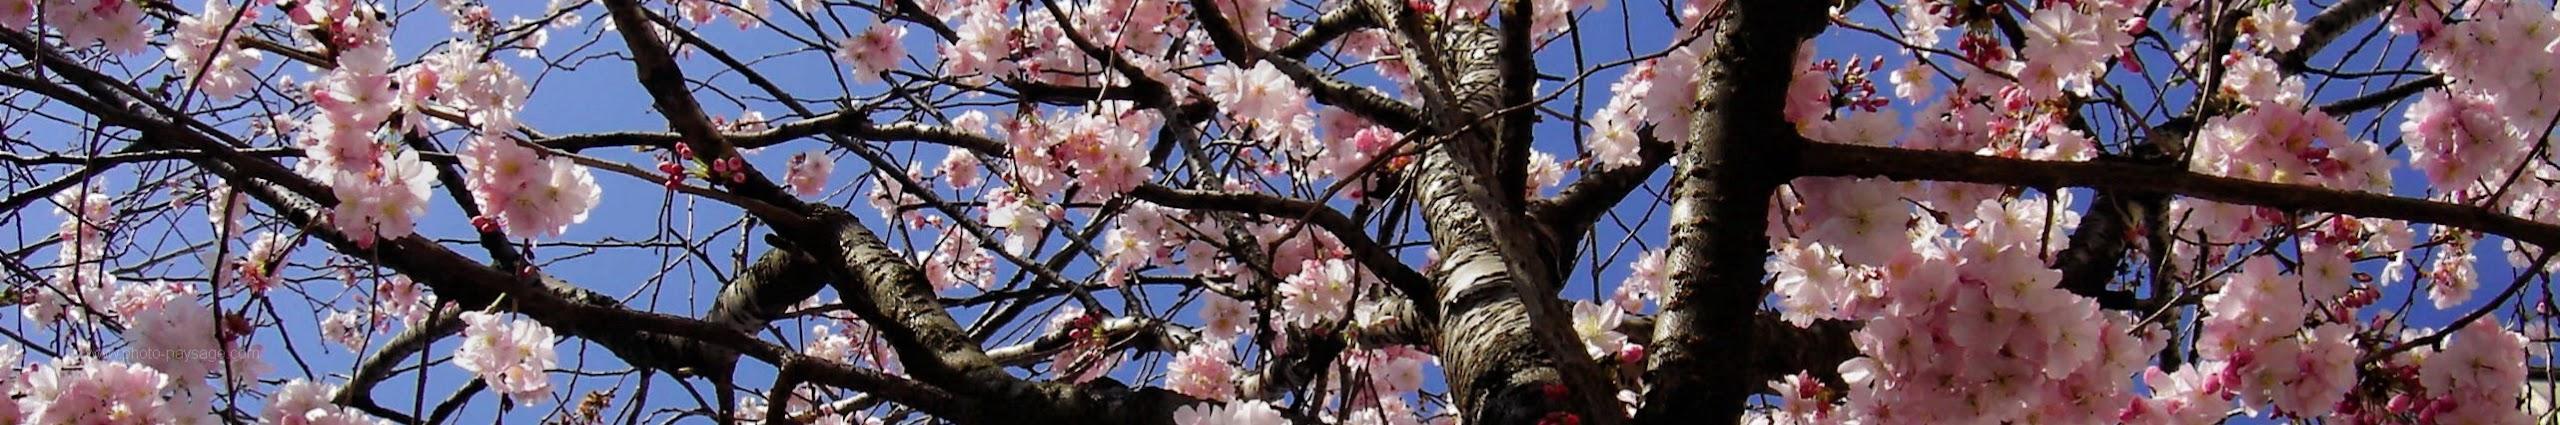 slăbire sakura)